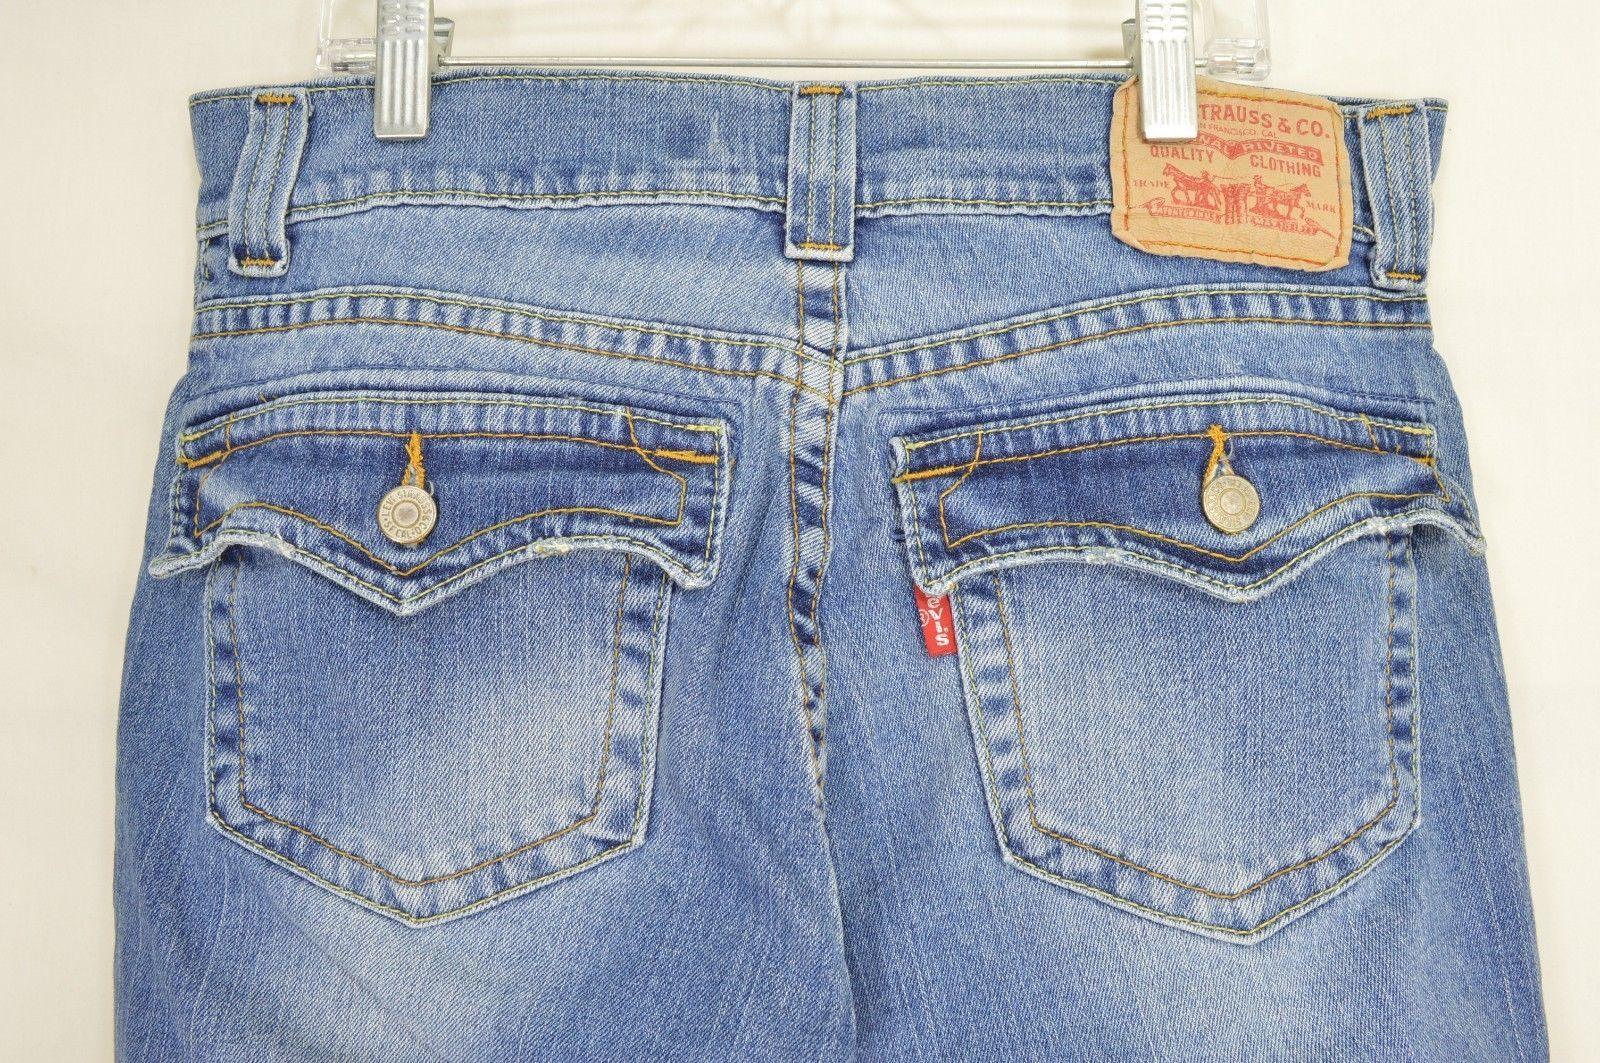 Levi 542 jeans slouch 10 x 31 flare twisted leg flap back pockets boho hippie image 4